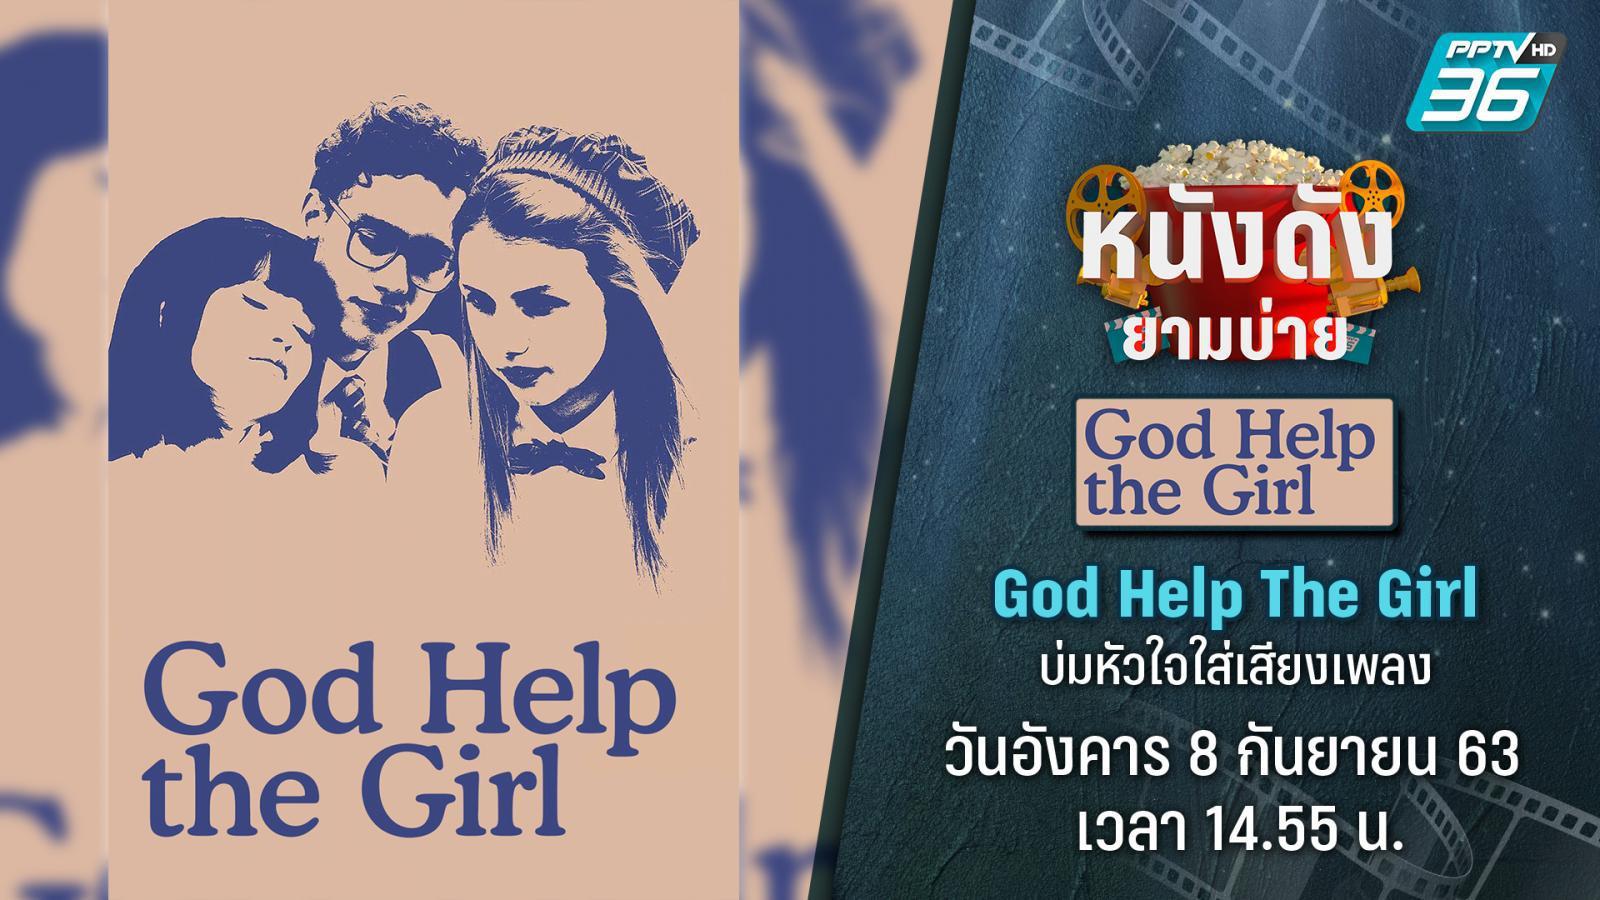 God Help The Girl บ่มหัวใจ ใส่เสียงเพลง